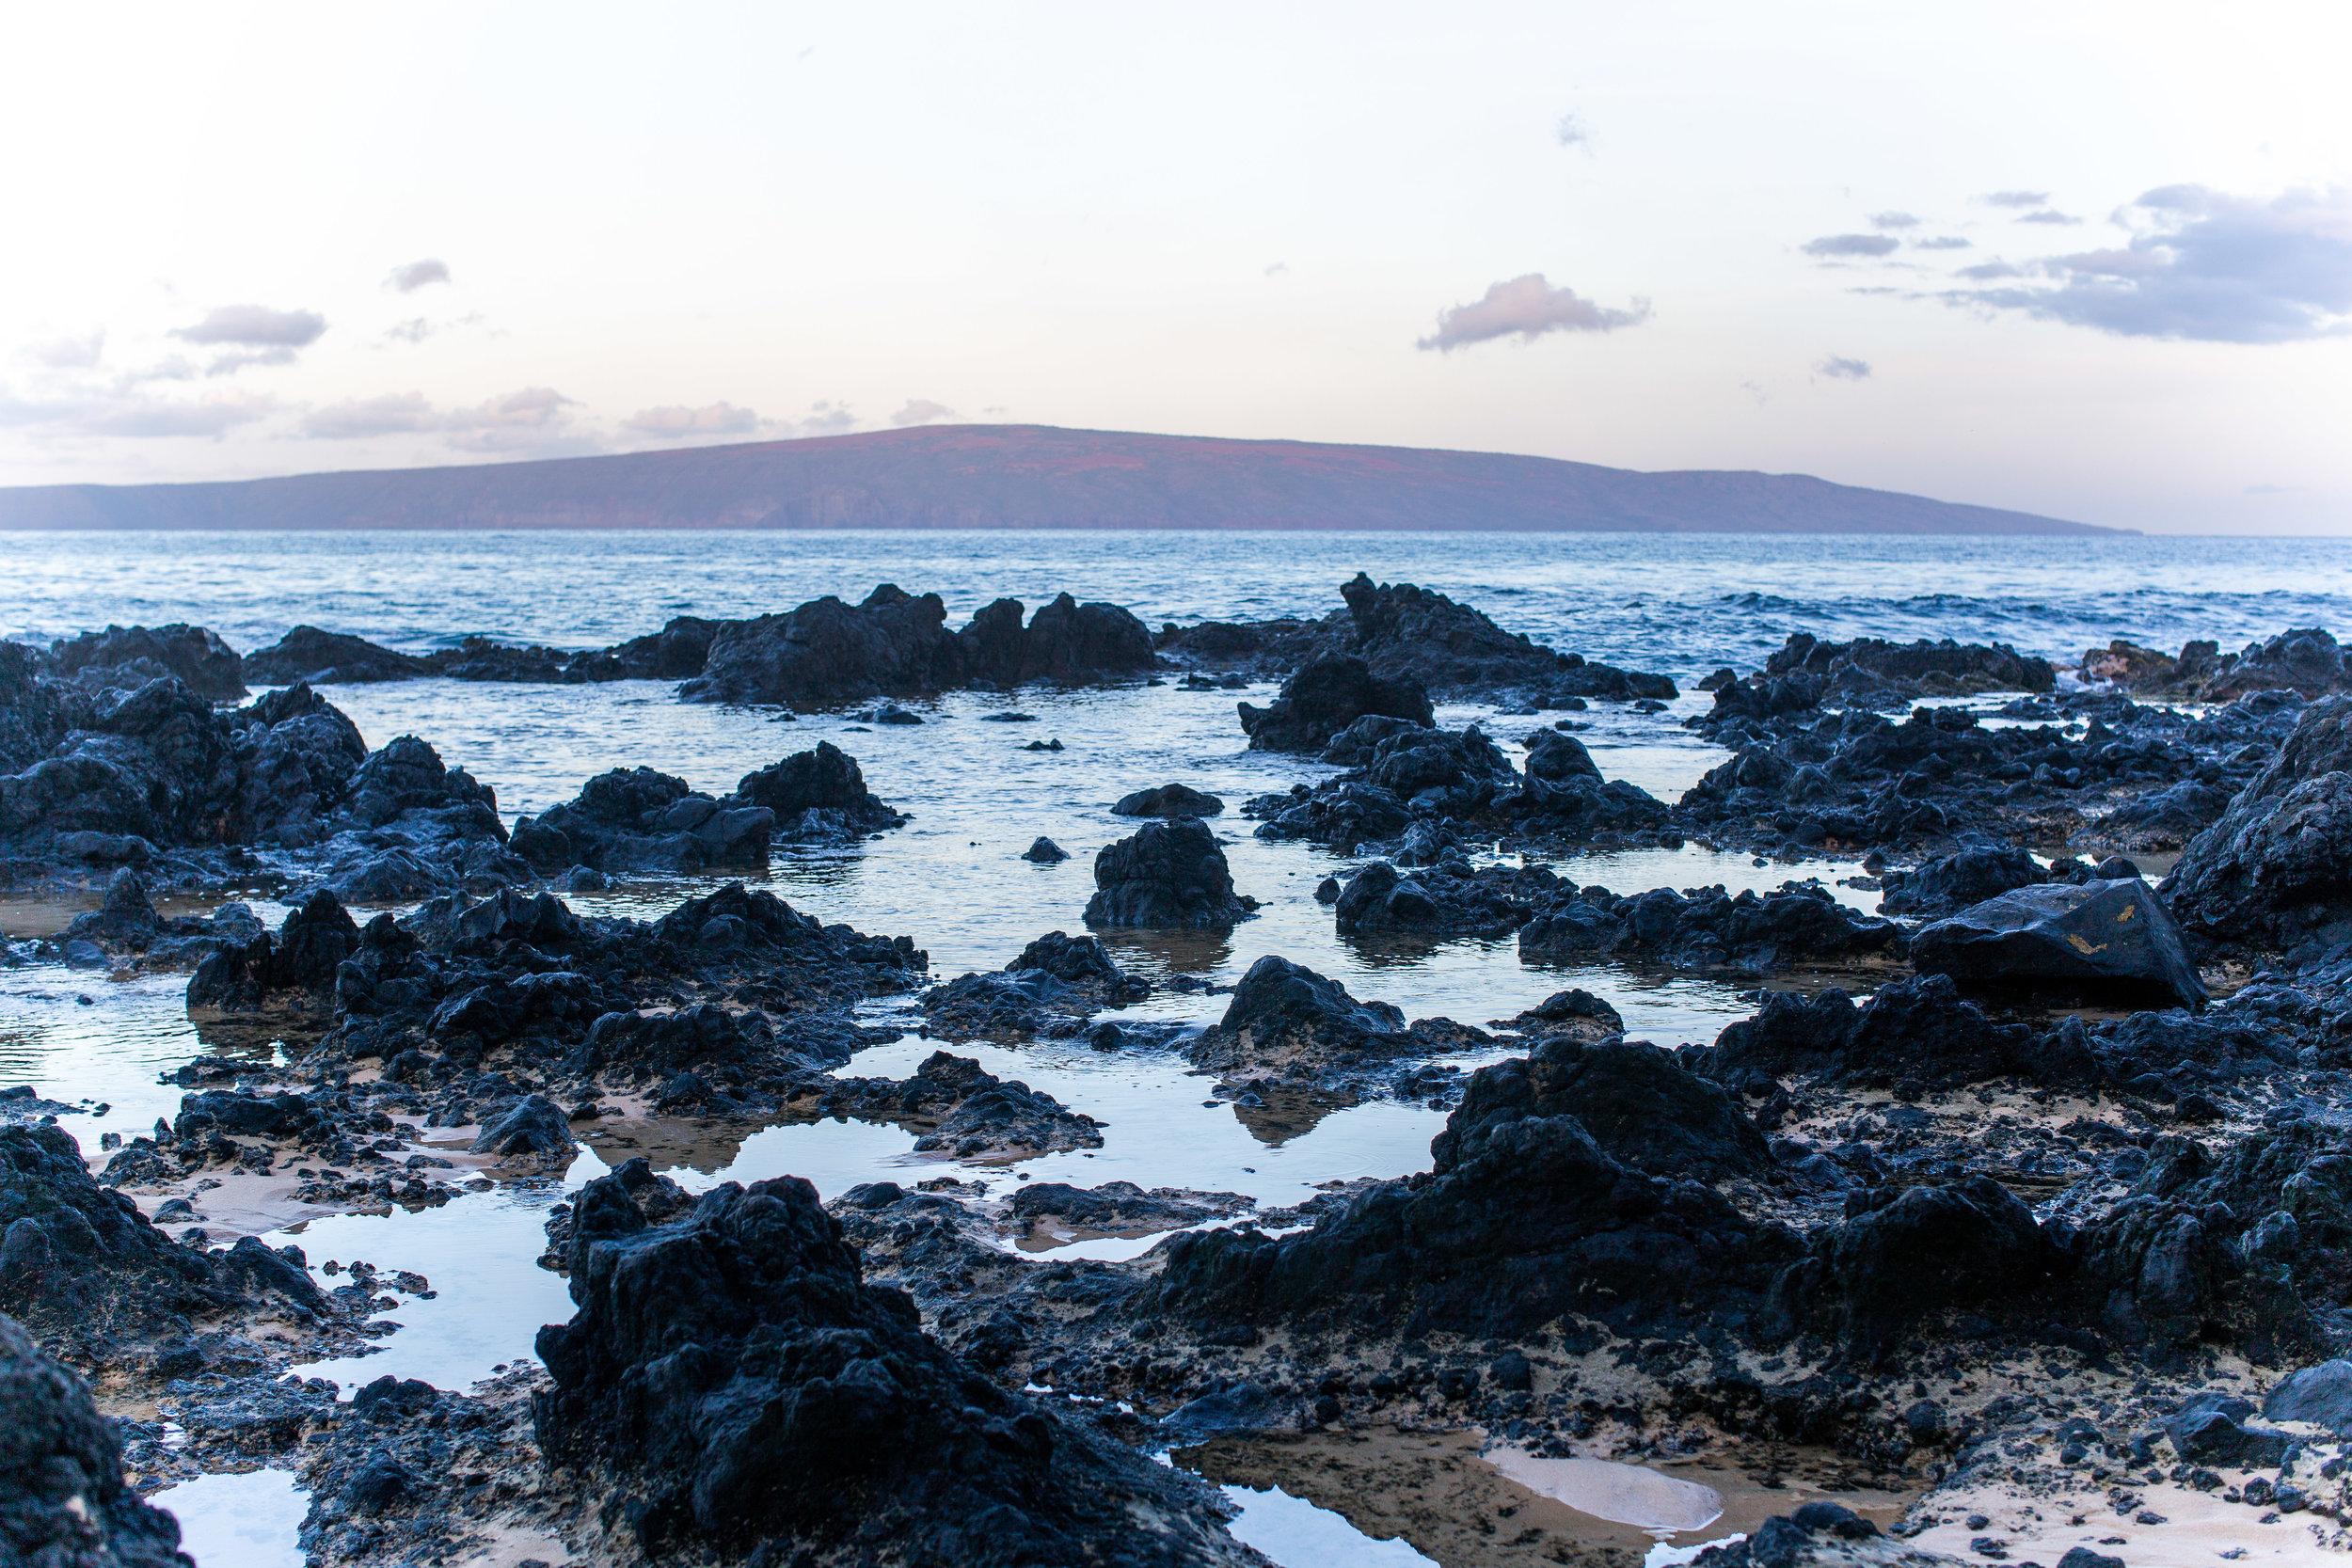 fizz-fade-hawaii-sunrise-stripes2-84.jpg